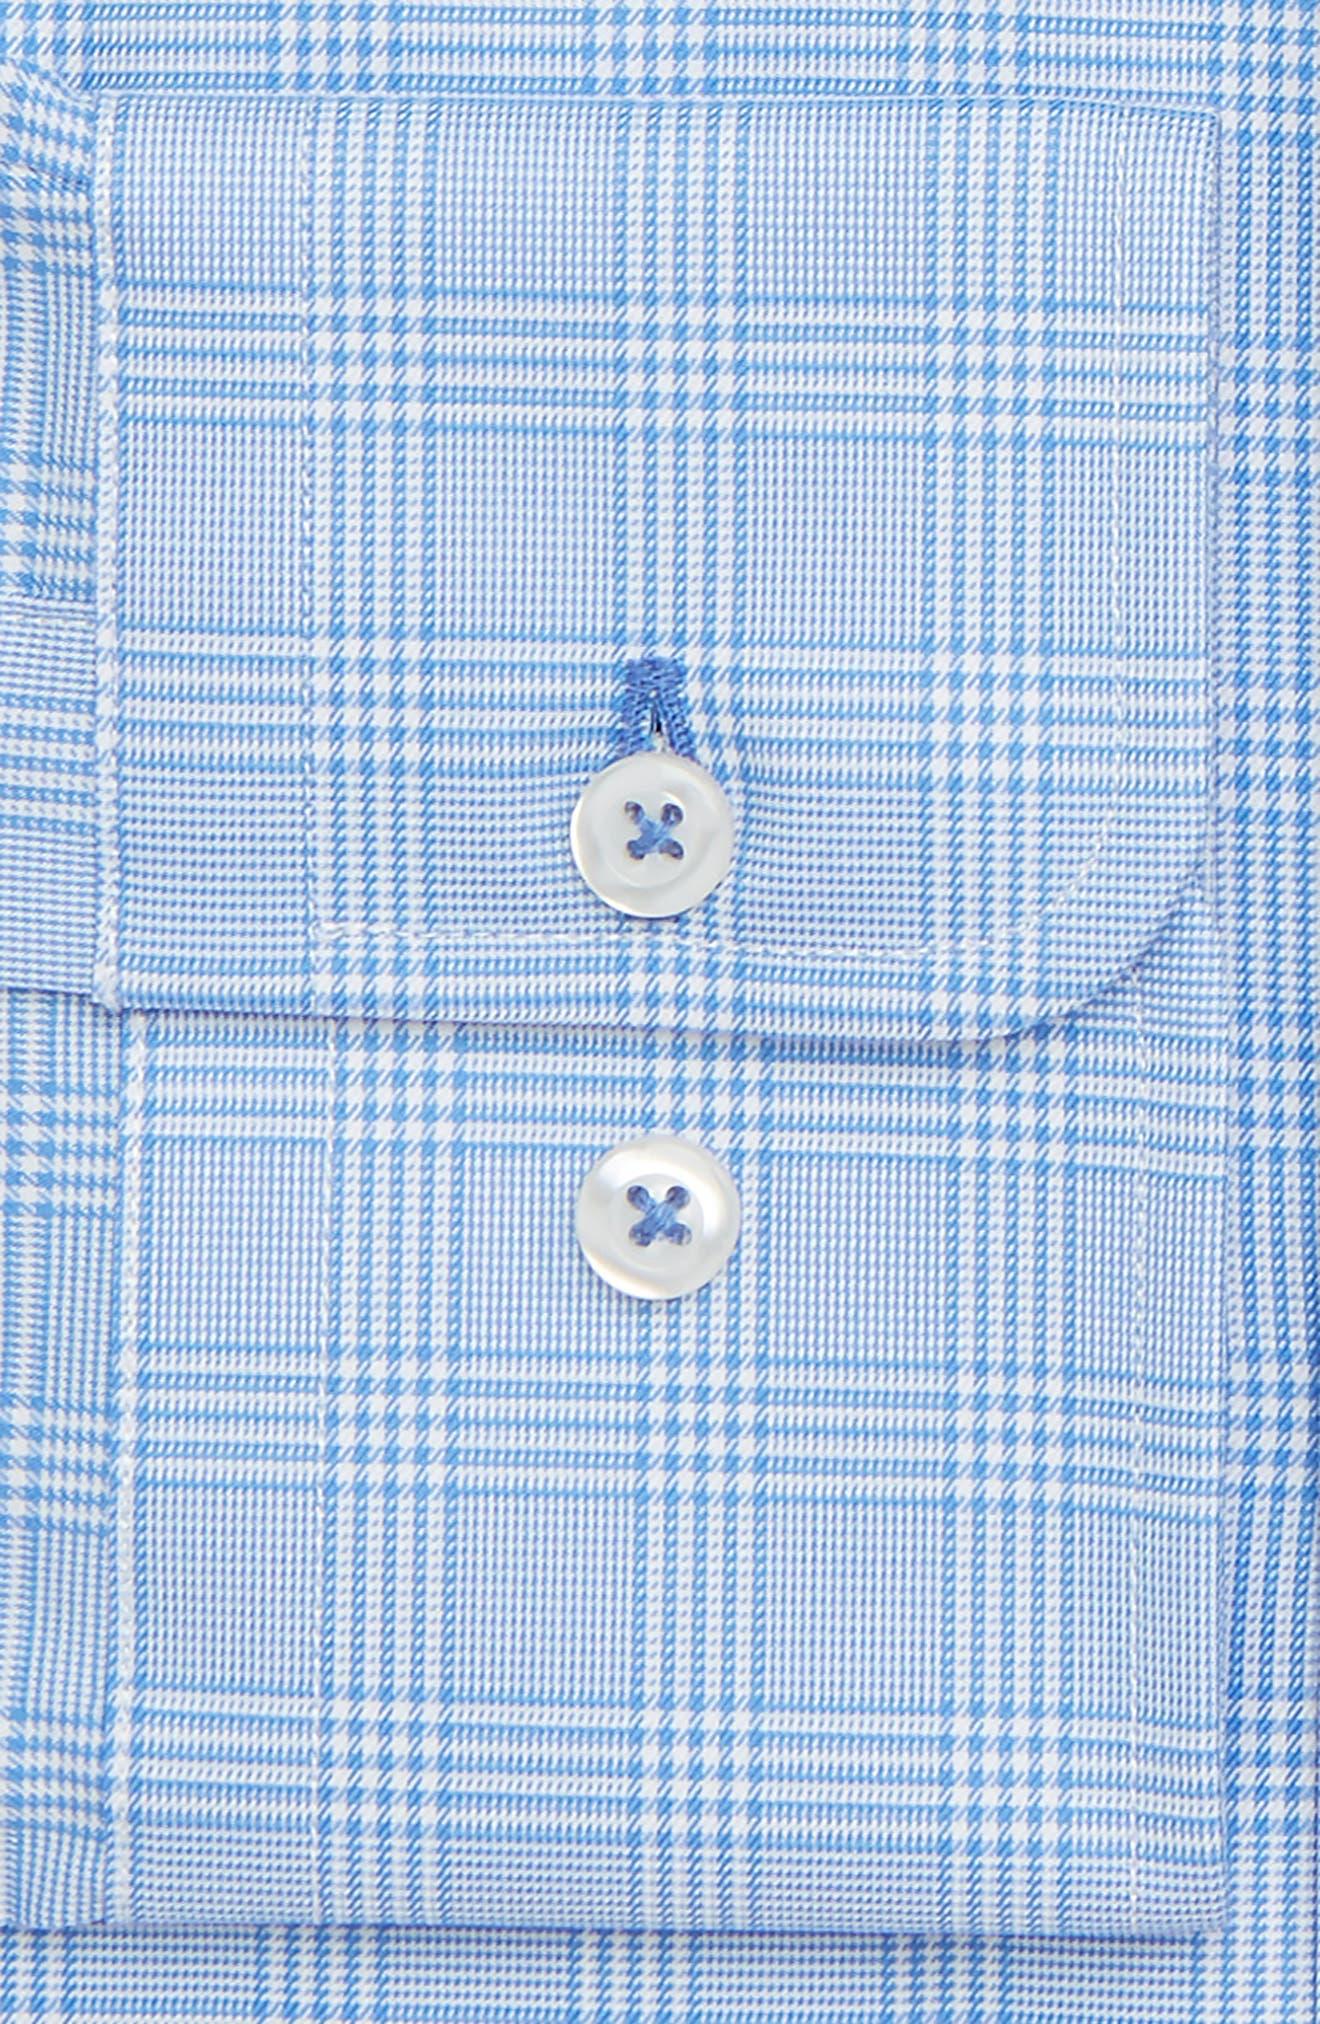 Regular Fit Plaid Dress Shirt,                             Alternate thumbnail 6, color,                             BLUE